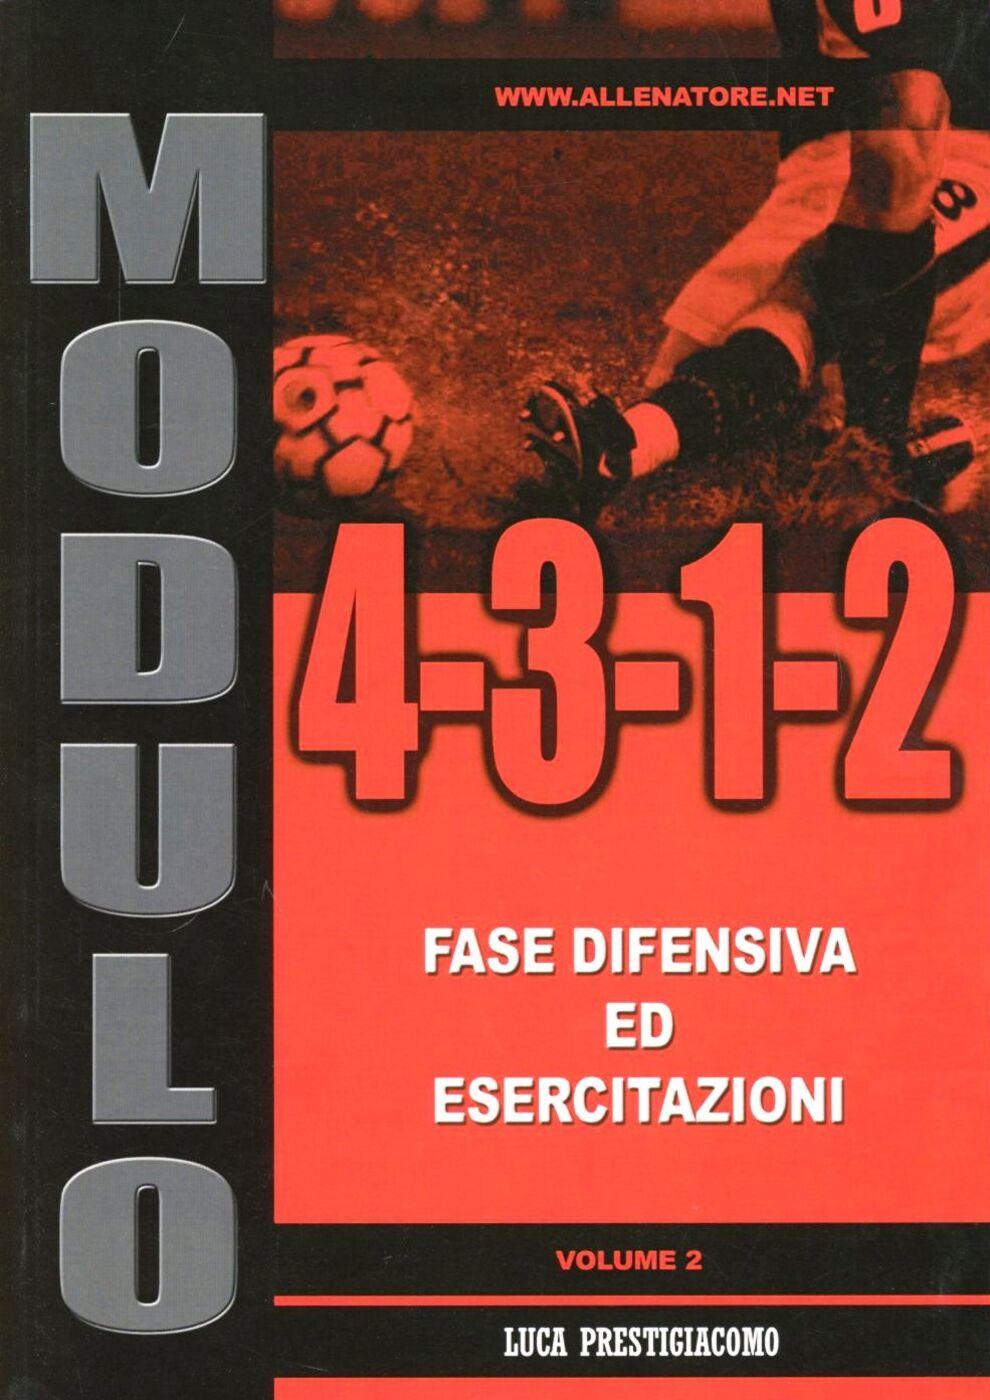 4-3-1-2 Fase difensiva ed esercitazioni